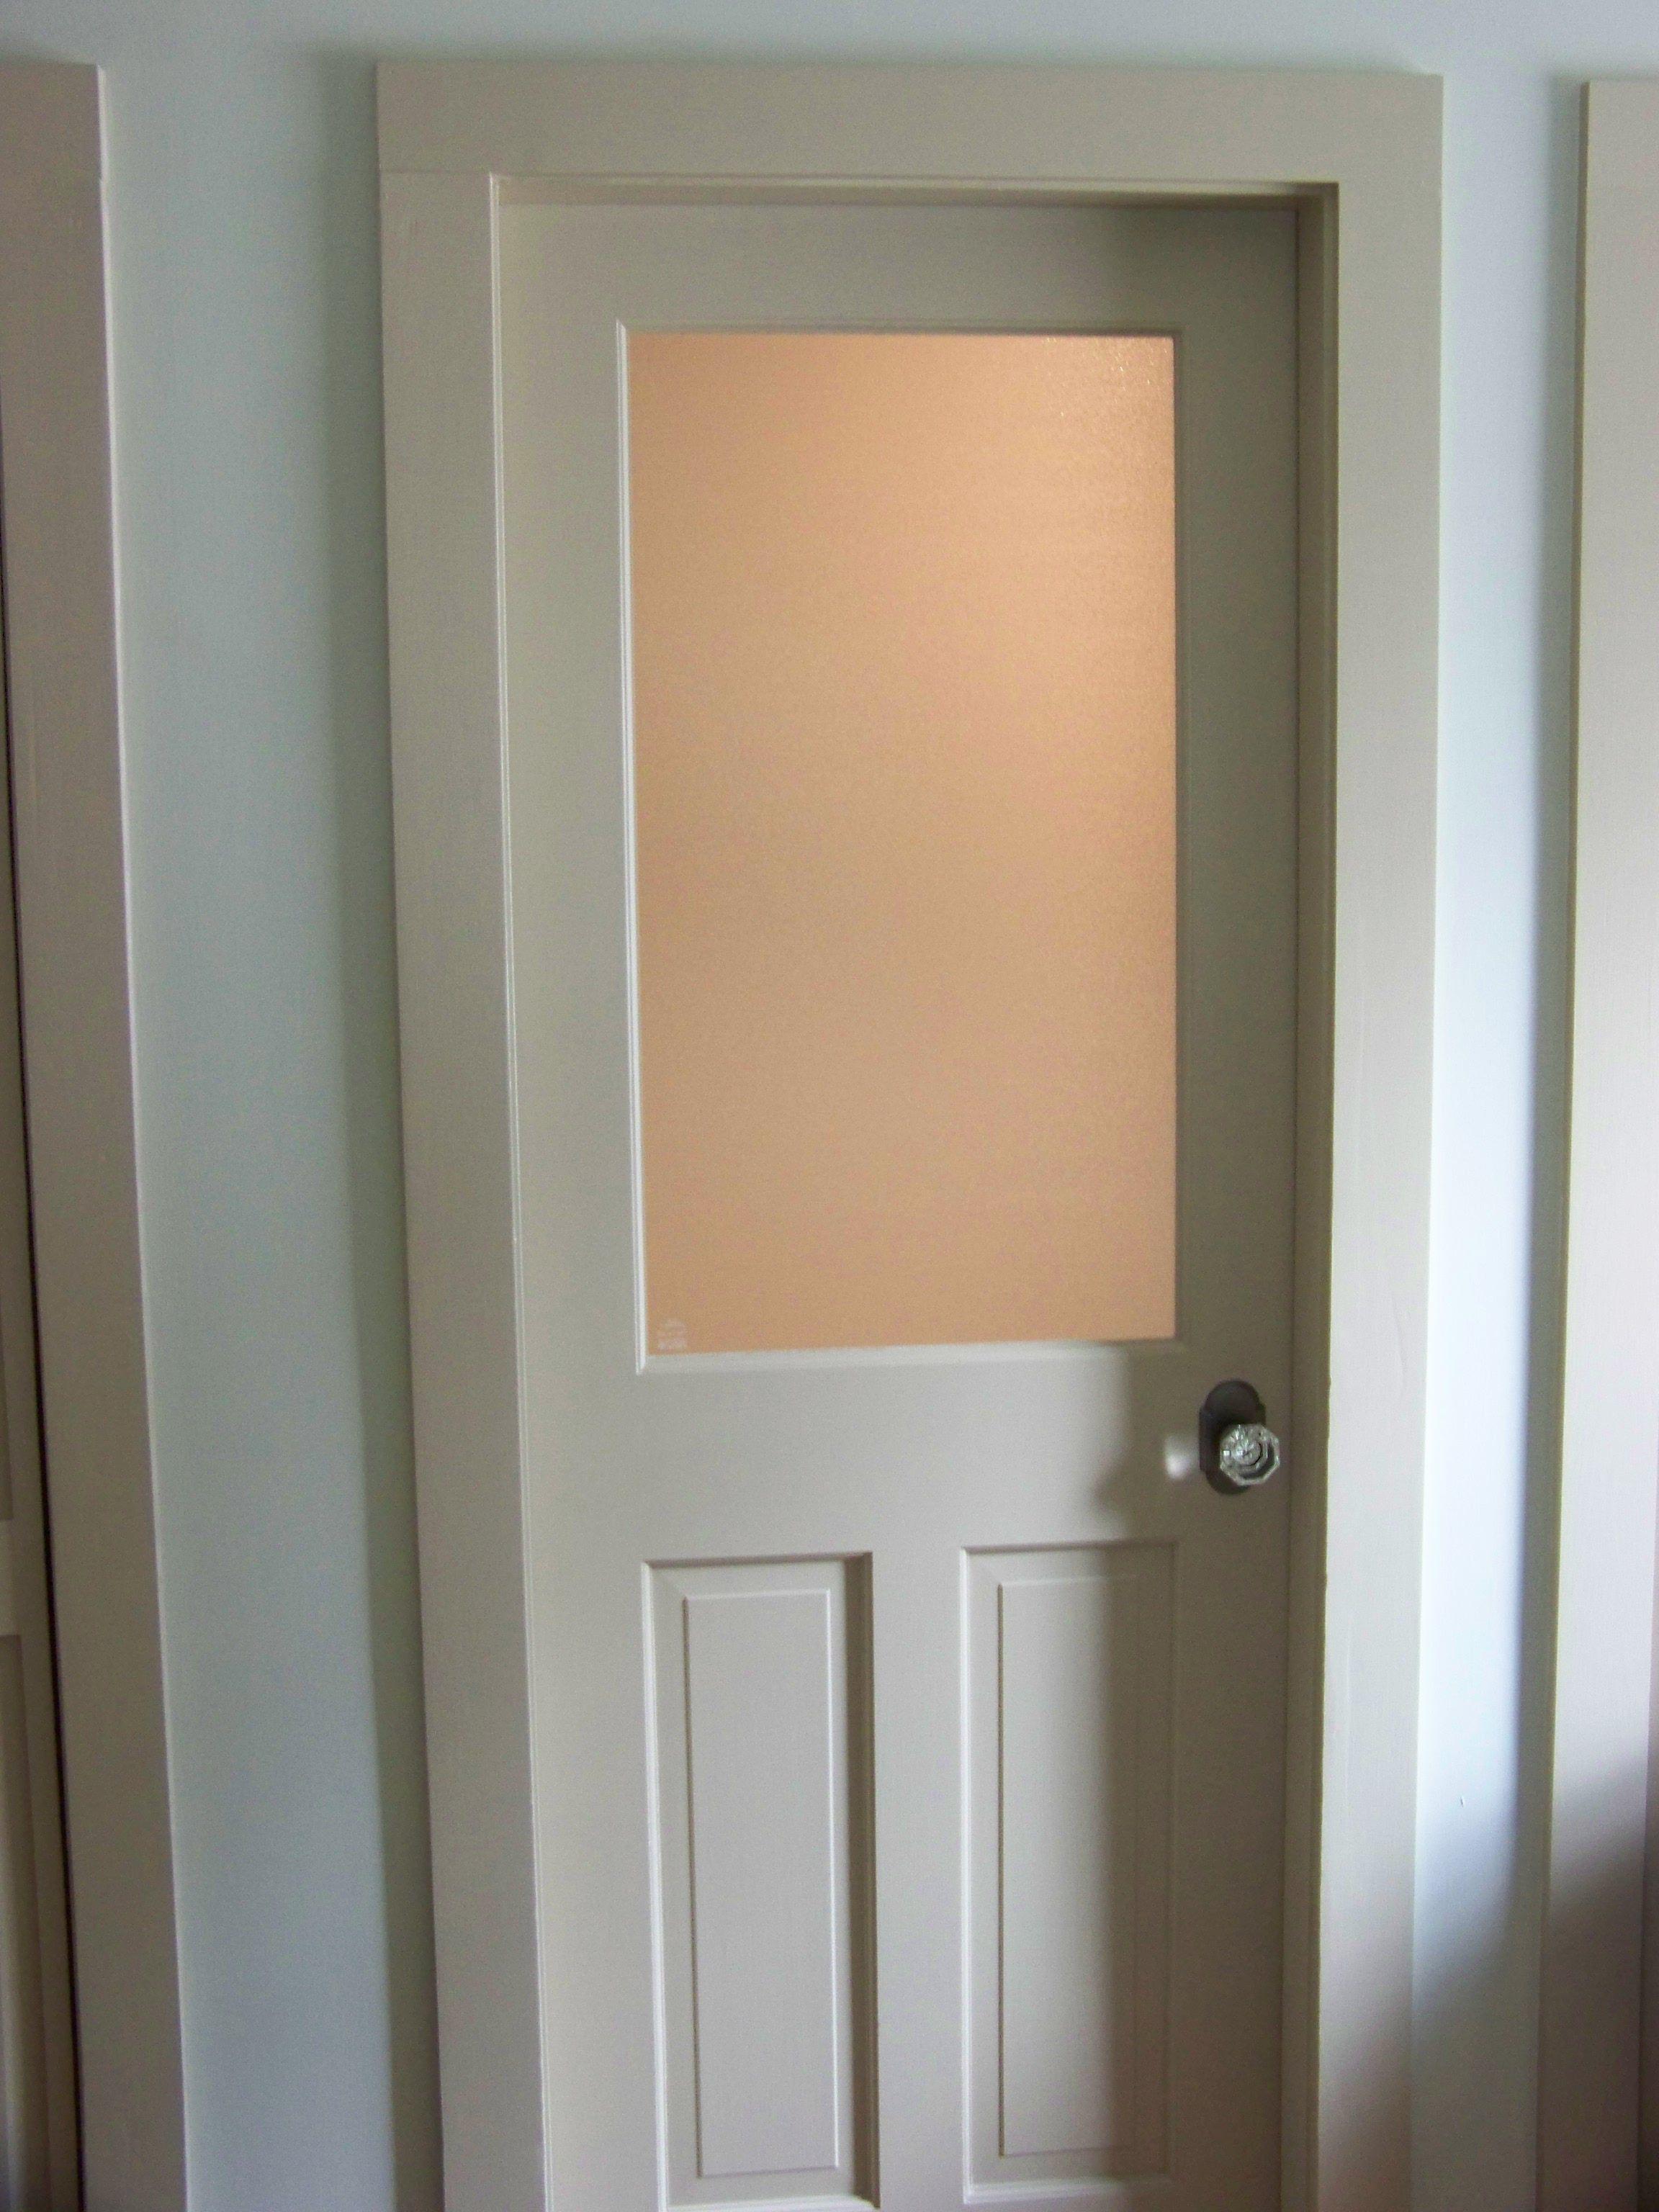 Glass Panel Interior Doors Interior Bathroom Exceptional Half Glass Single Swing Bathroom Doors Glass Pantry Door Glass Doors Interior Half Glass Interior Door